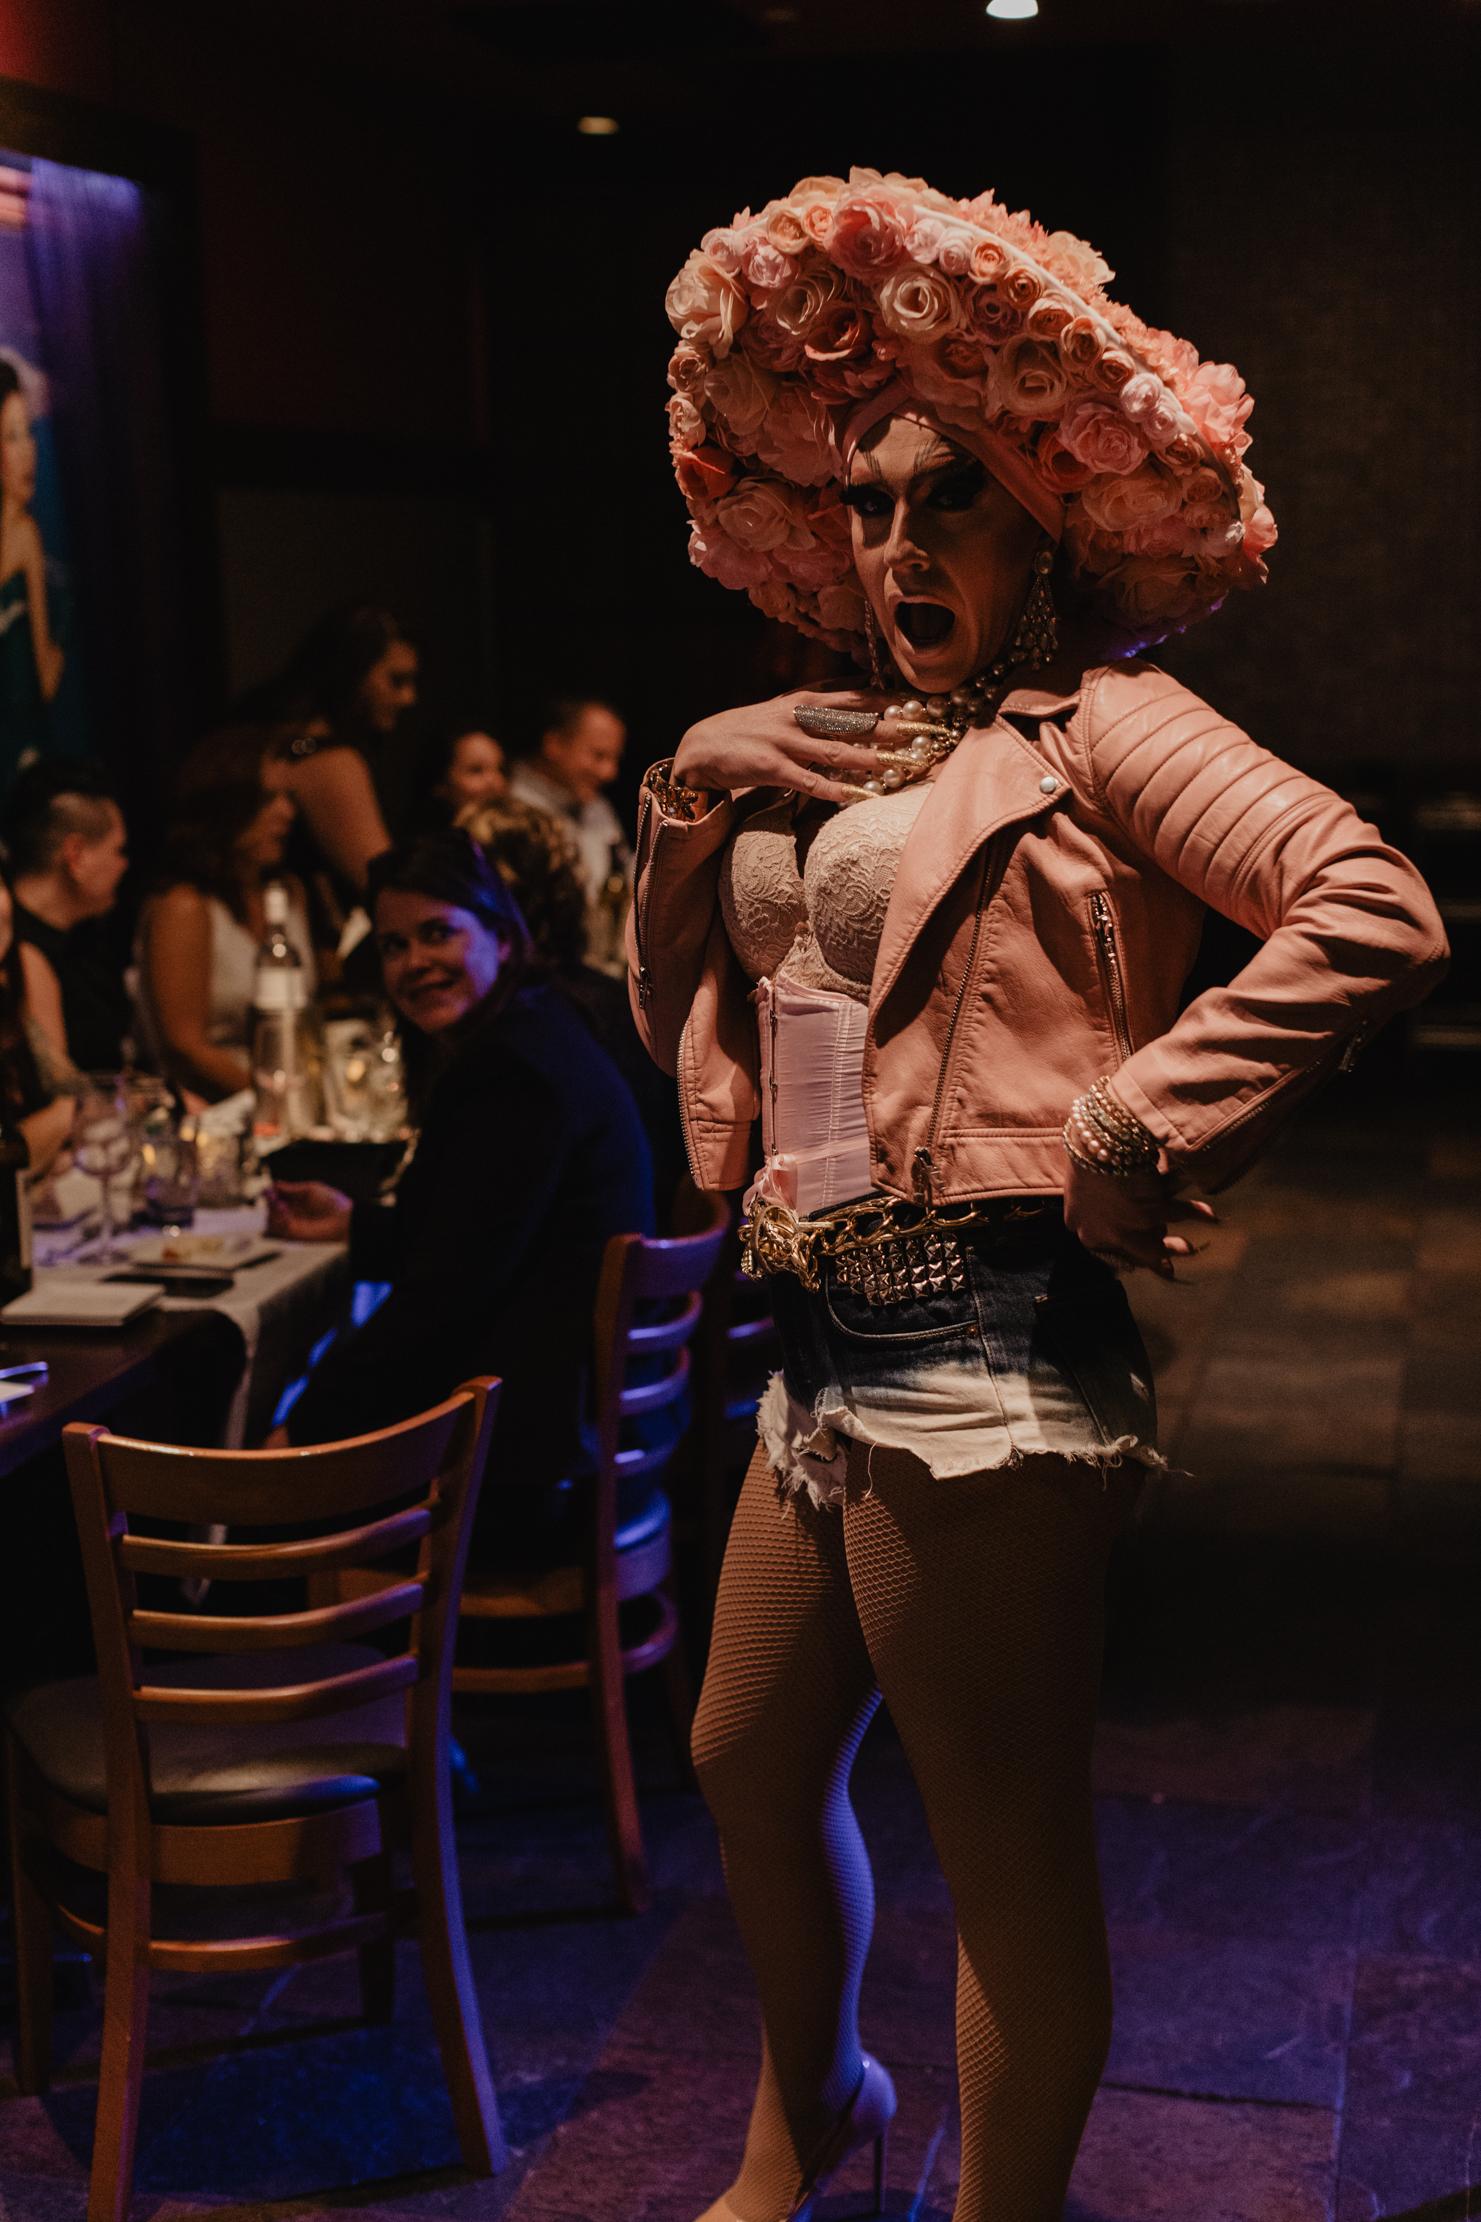 Drag Show Wedding Reception at Suzy Wong's | LGBT Nashville Wedd